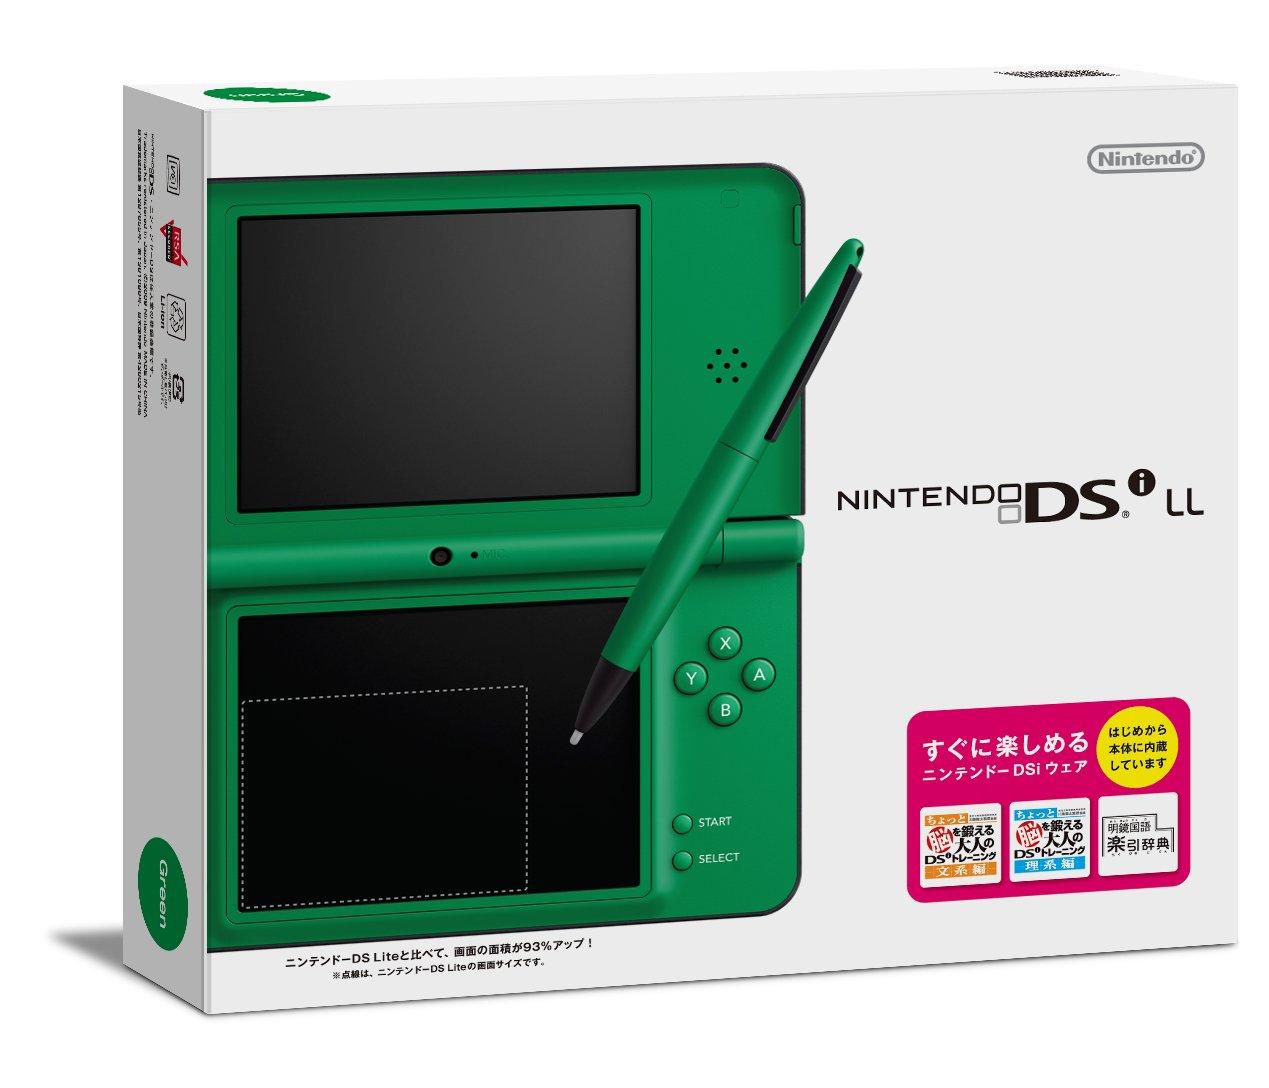 amazon com green nintendo dsi ll video games rh amazon com Nintendo XL DSi Operations Manual Nintendo DSi Case